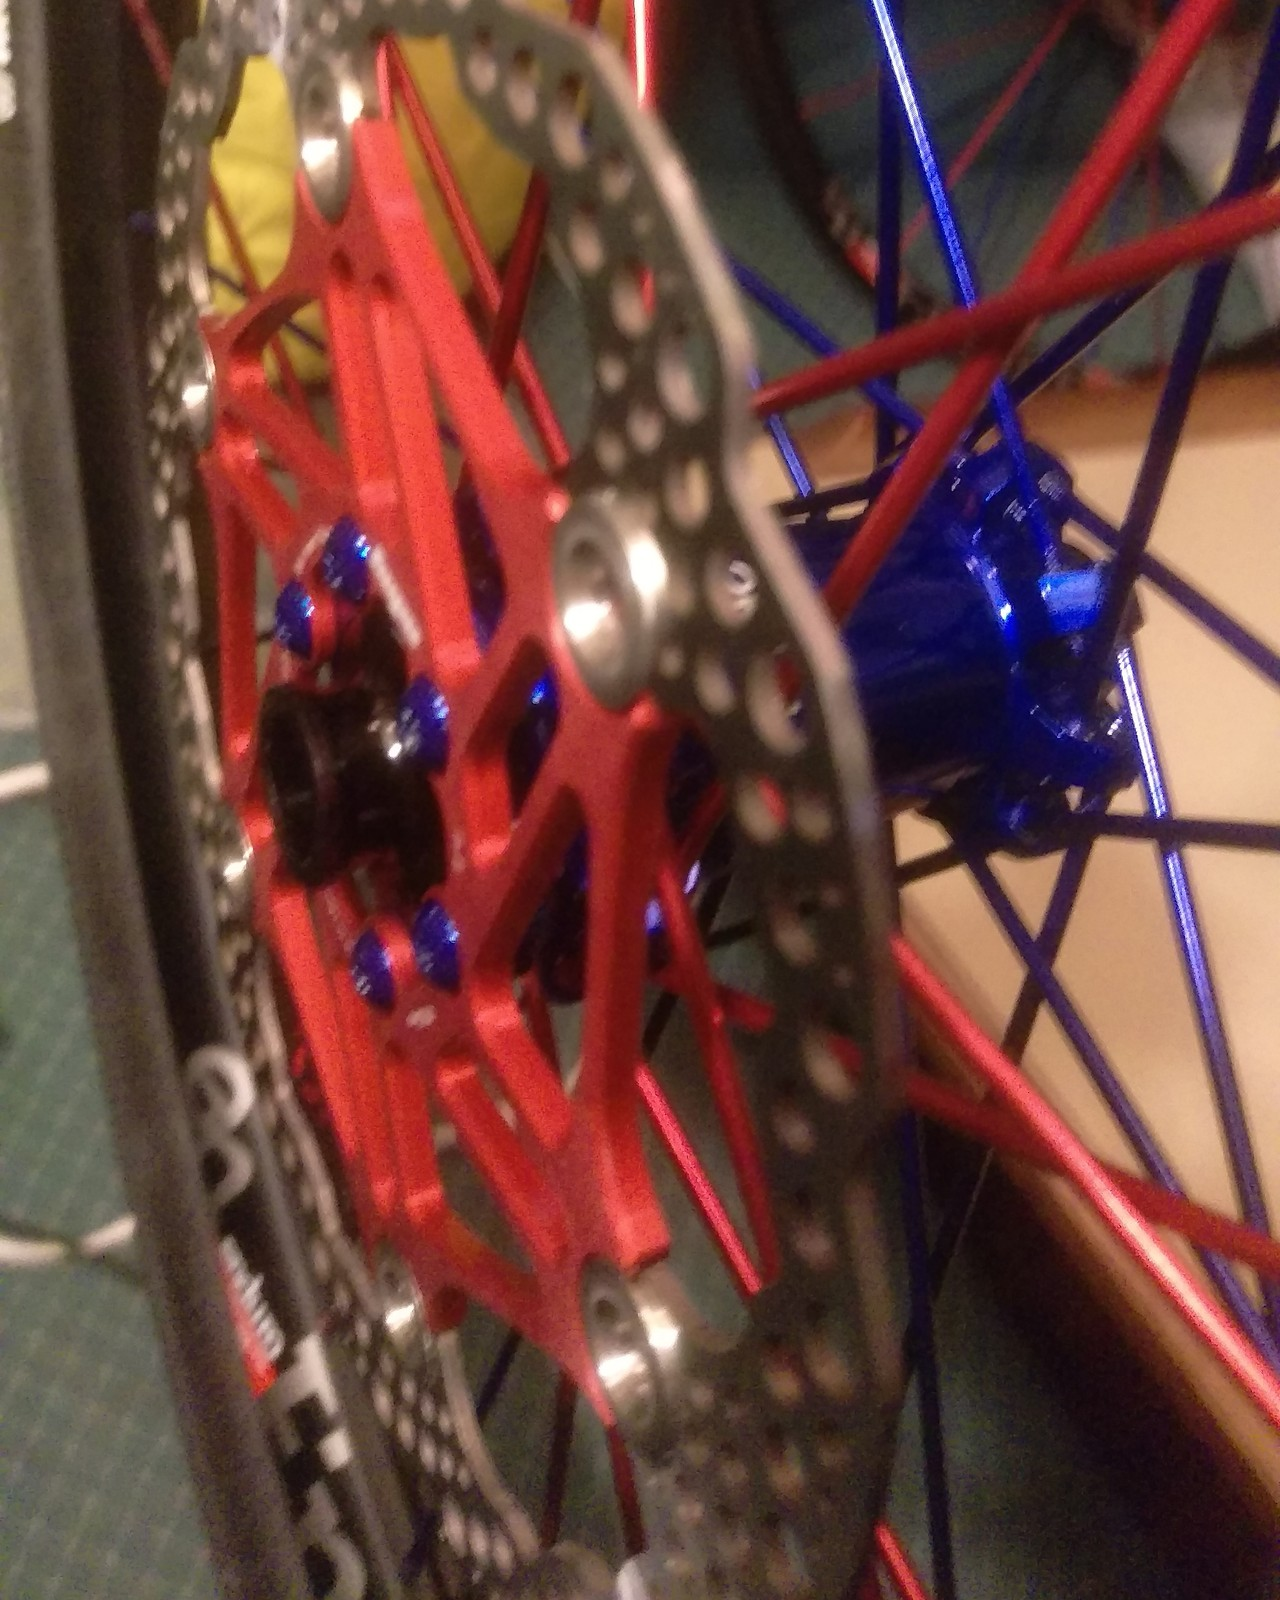 IMG 20161222 191155 - 1morebike - Mountain Biking Pictures - Vital MTB